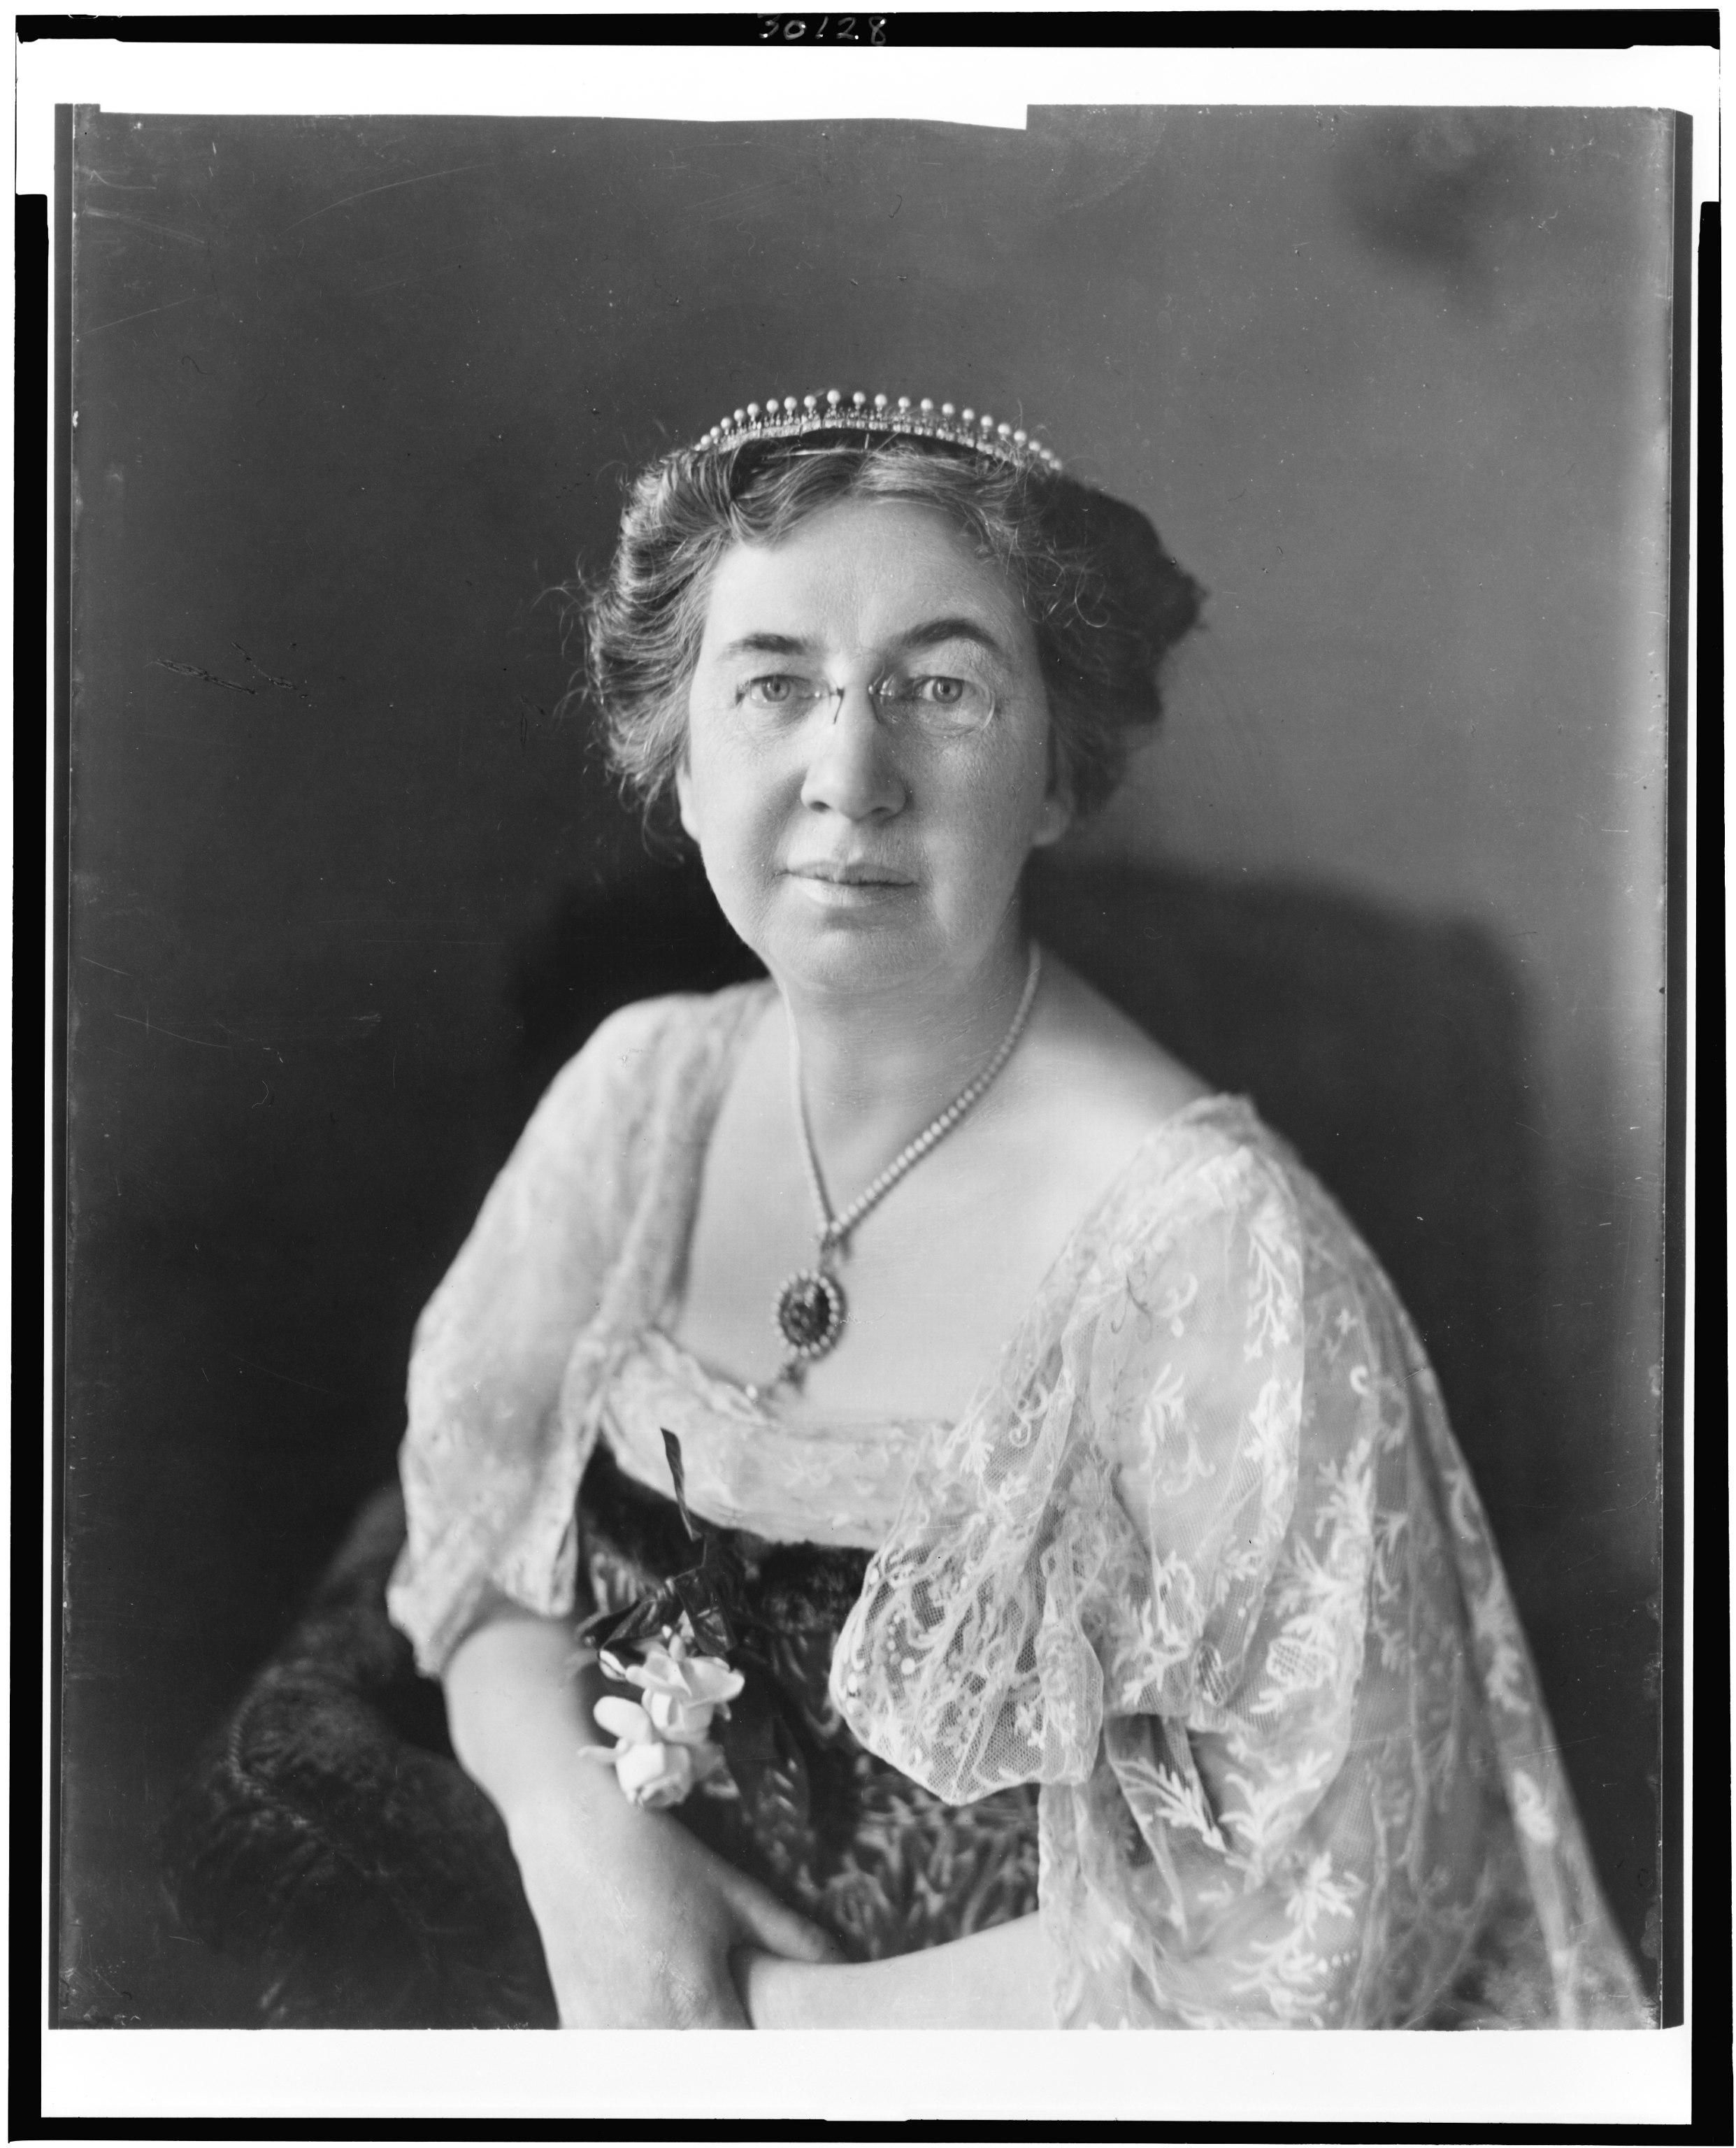 Mabel Hubbard Bell, c. 1917